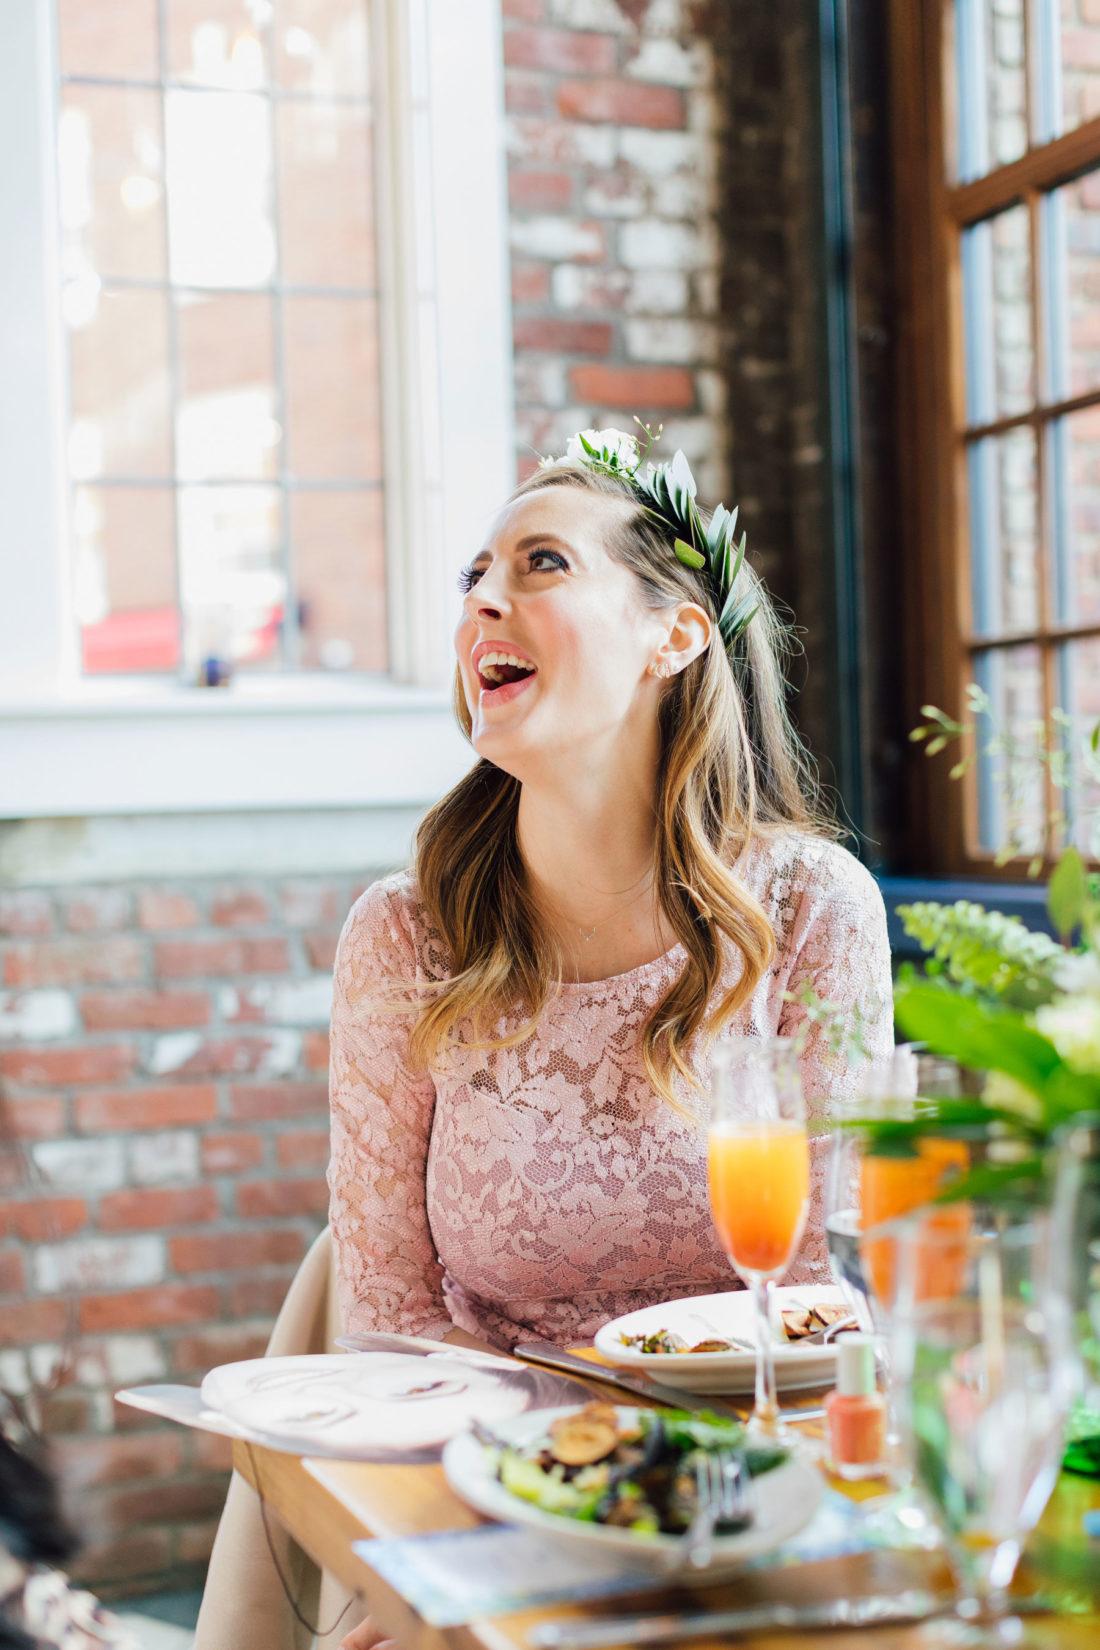 Blogger Eva Amurri laughs at her Baby Sprinkle